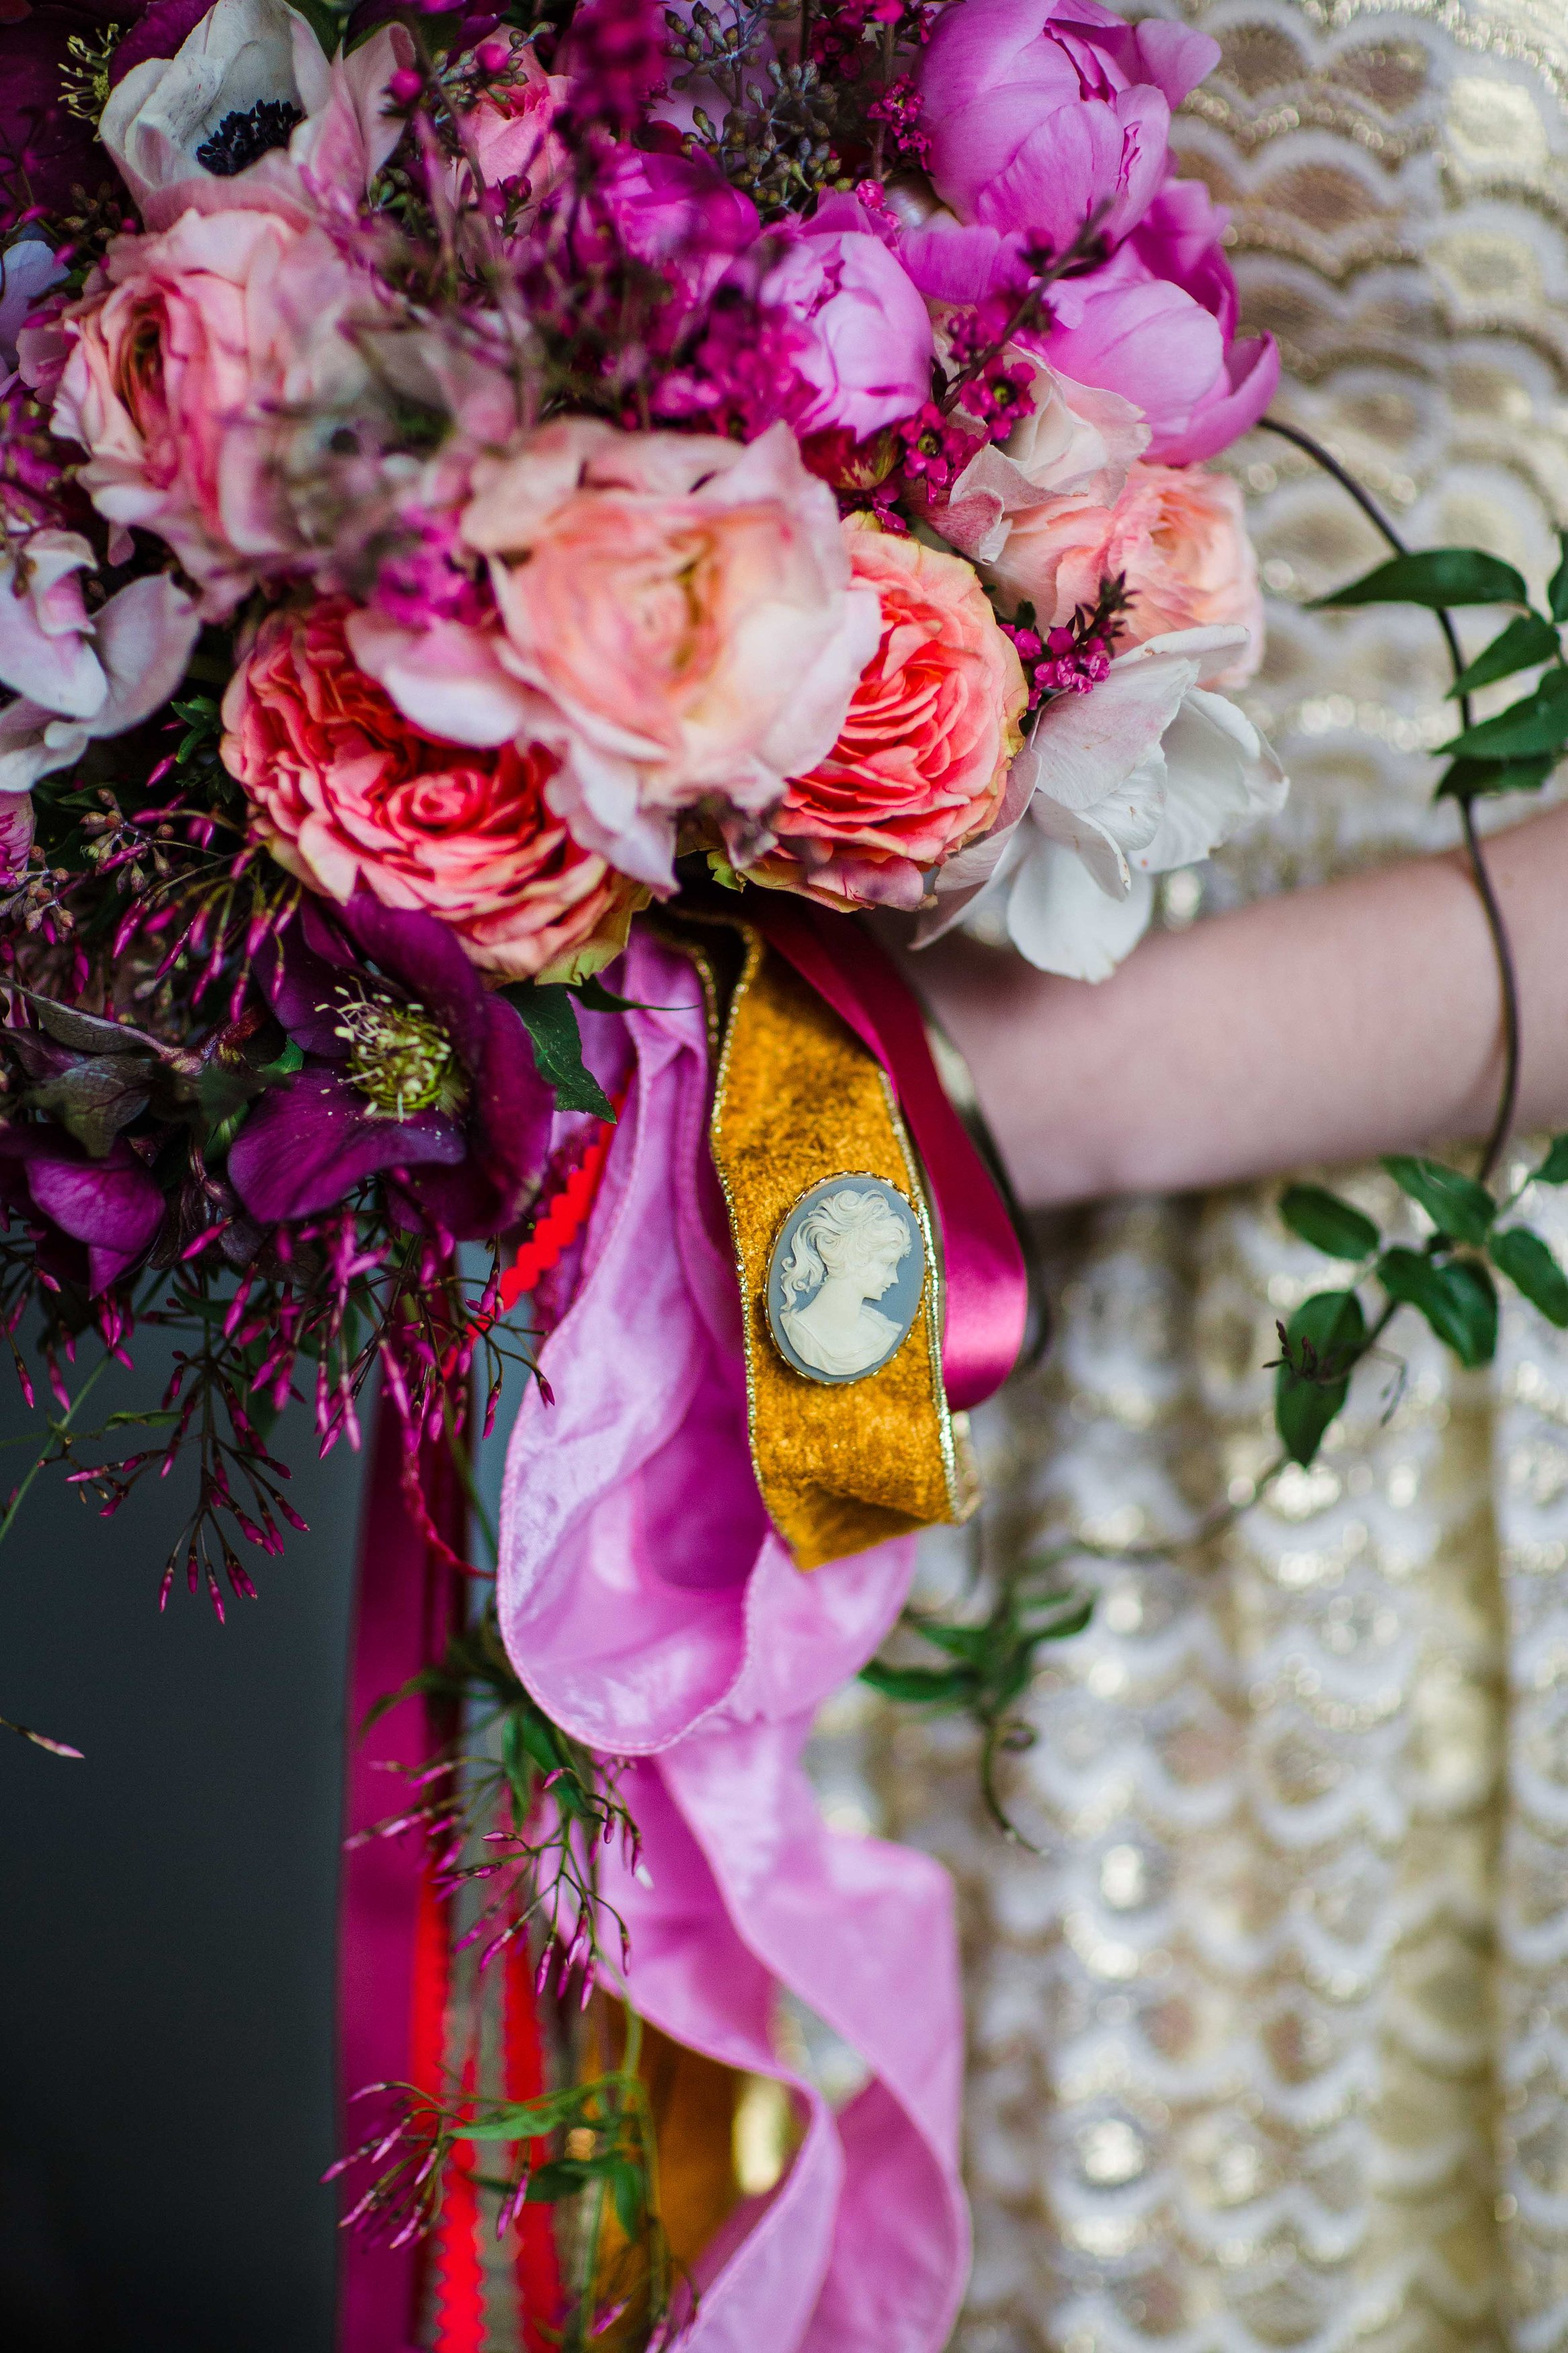 Courtenay Lambert Florals, Cincinnati Weddings, Cincinnati Wedding, Cincinnati Florists, Floral Designer, Event design, Floral Design, Cincinnati Florals, Wedding flowers